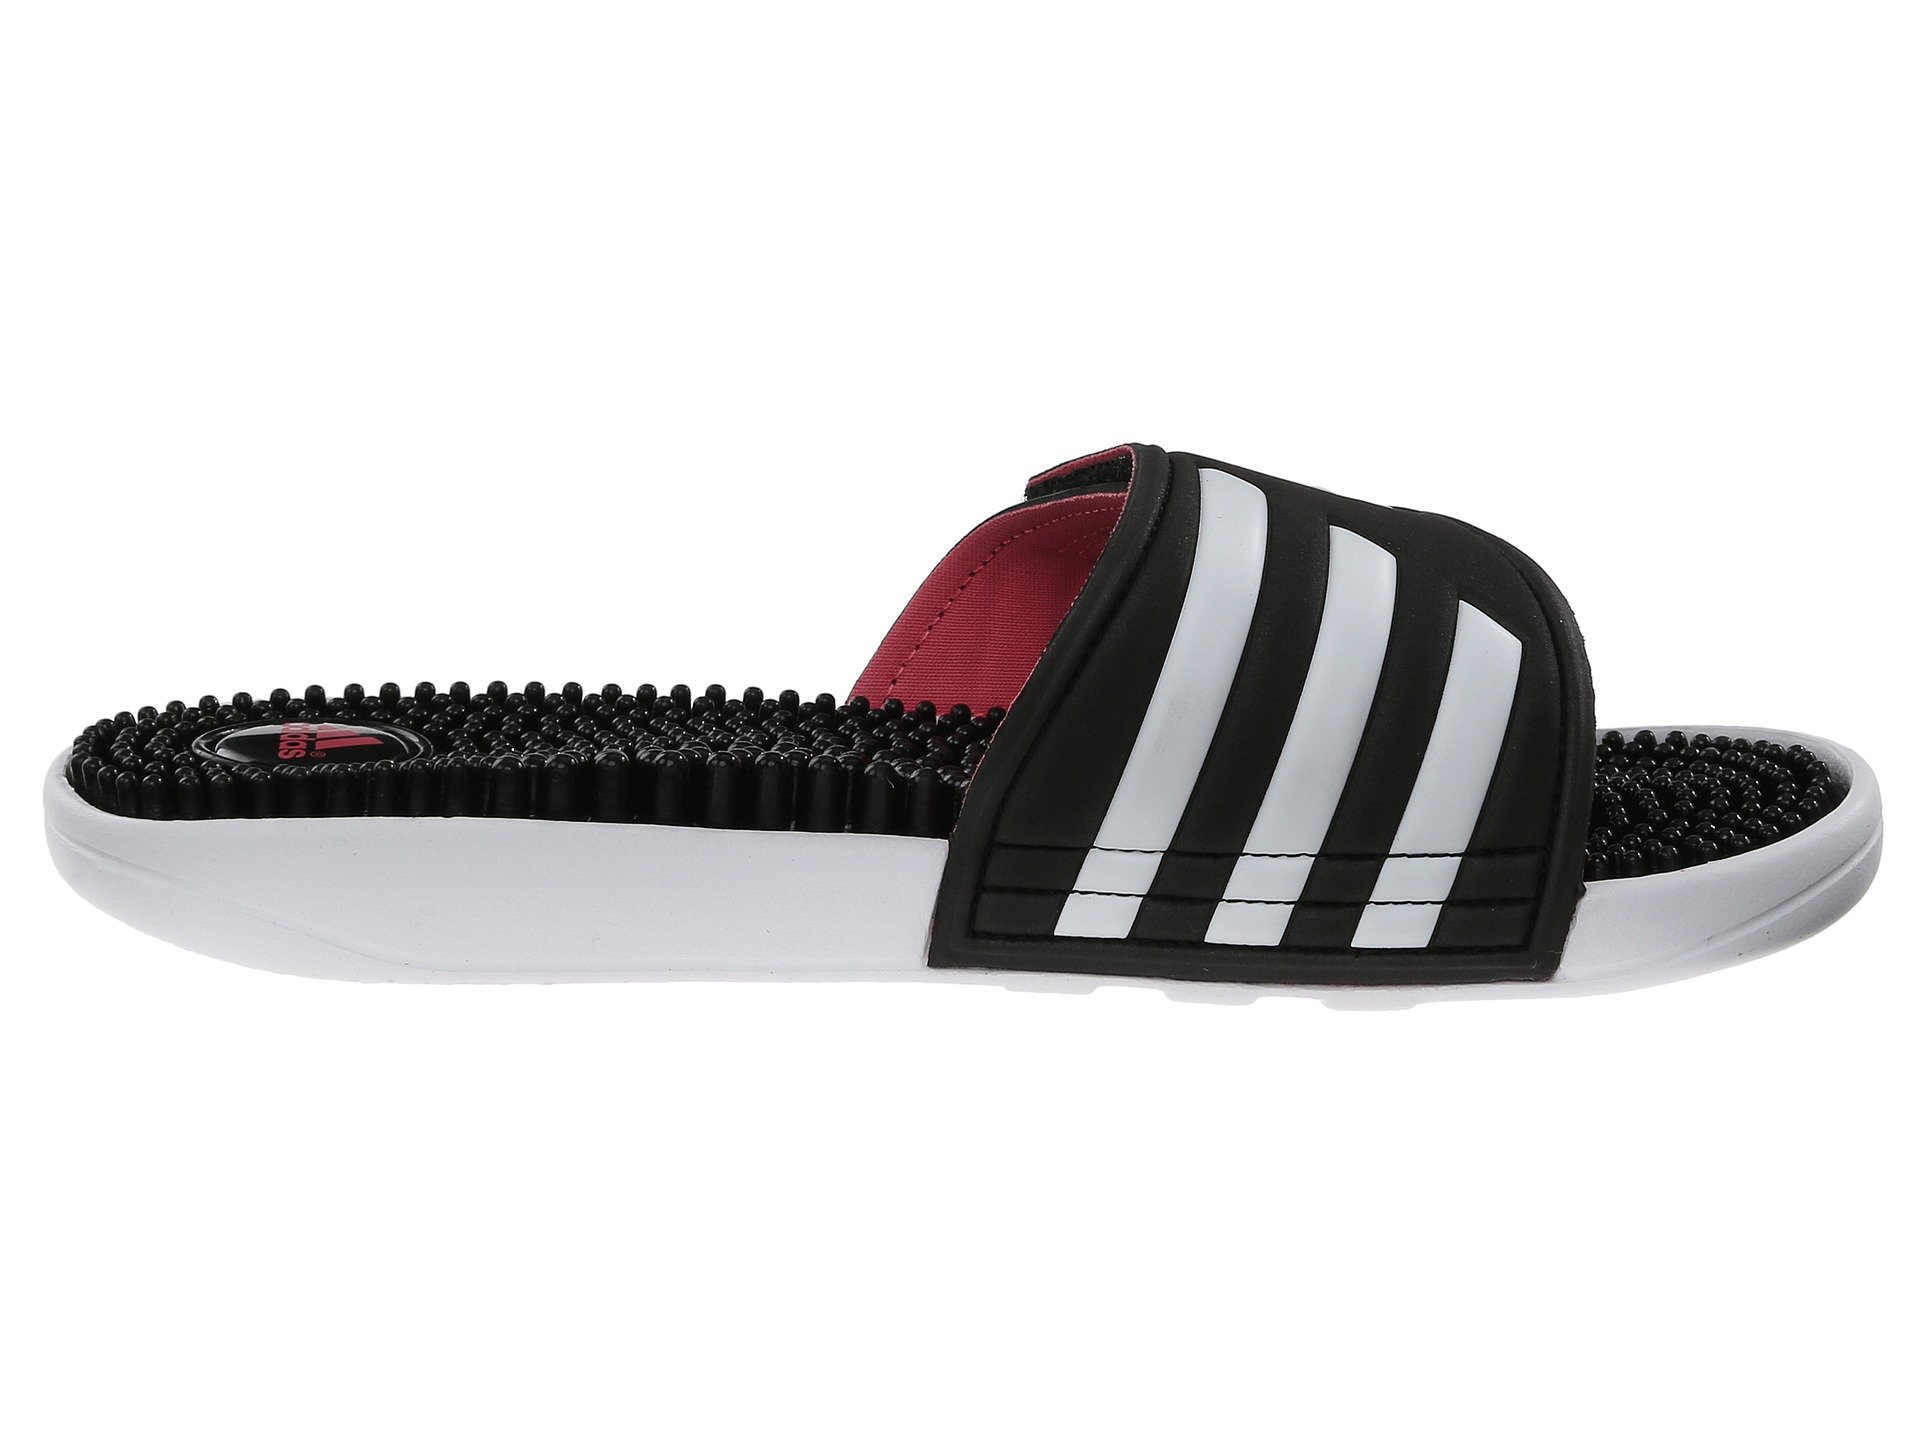 f65db0a0c7 Galleon - Adidas Women's Adissage Black/White/Super Pink 13 B US